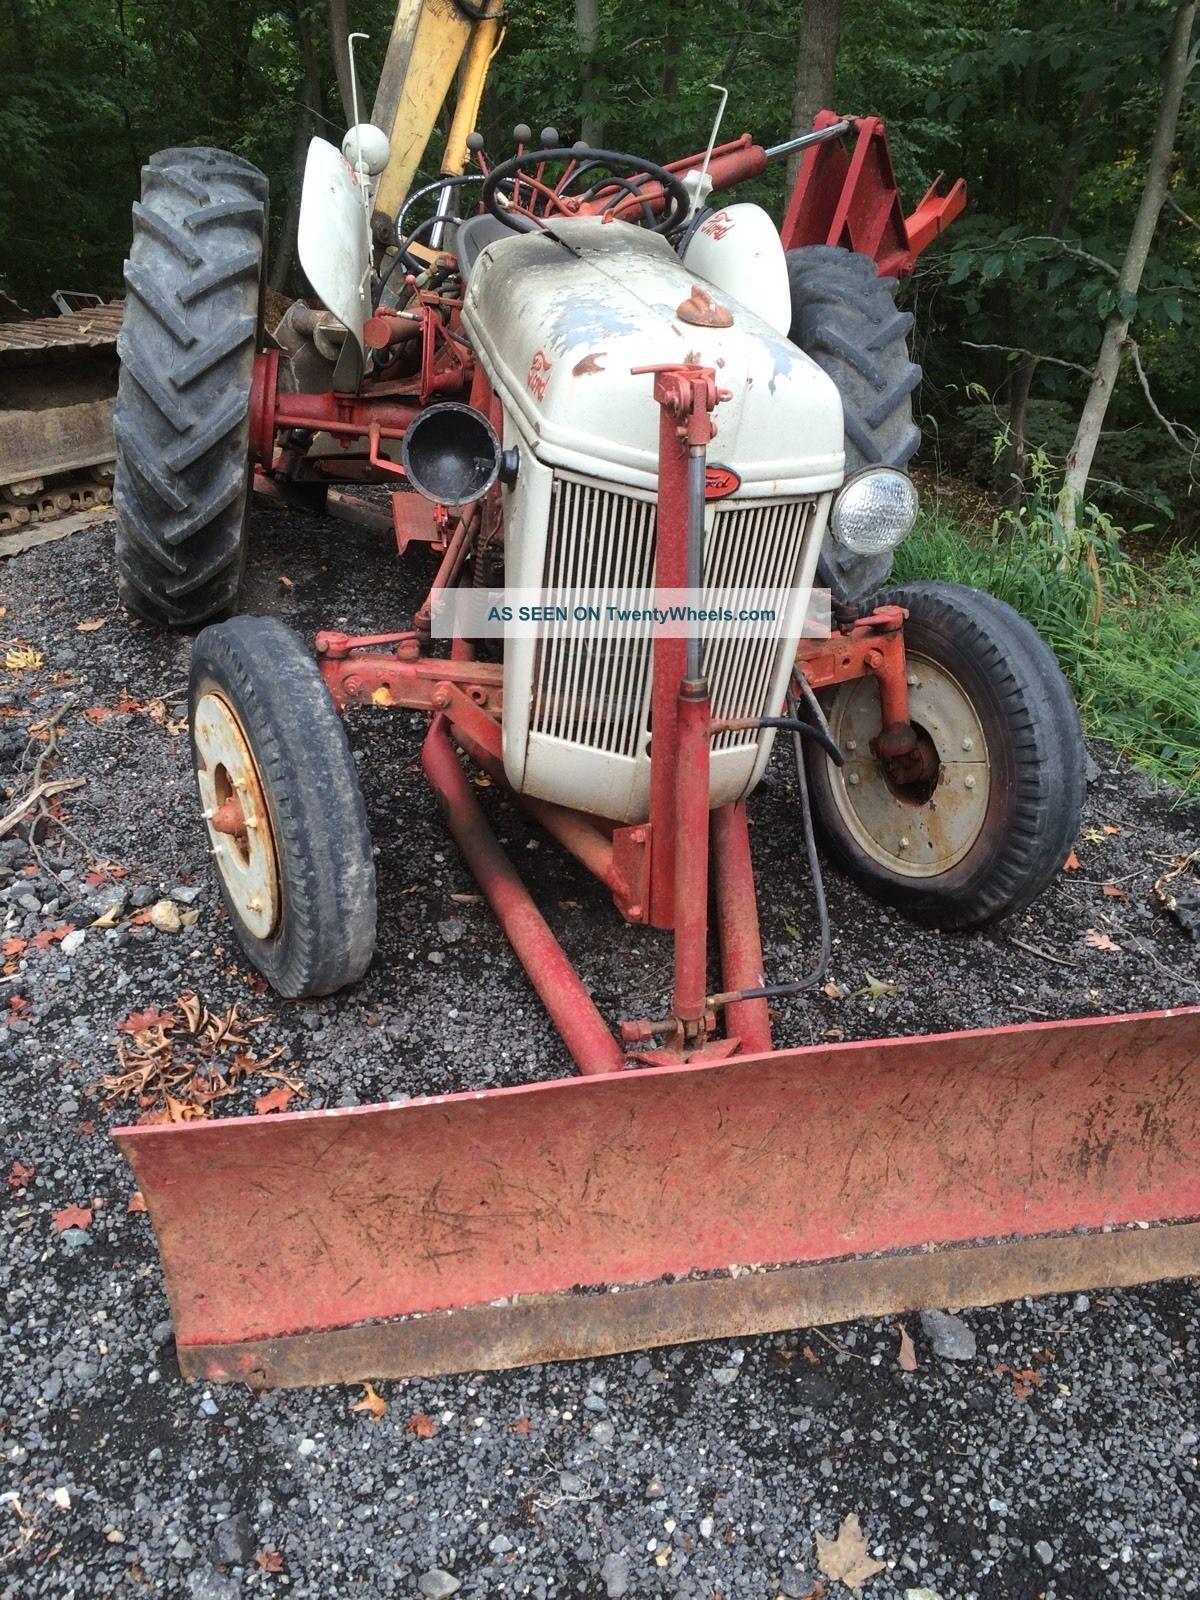 Sherman Backhoes For Ford Tractors : Ford n tractor with backhoe sherman hi lo range dozer